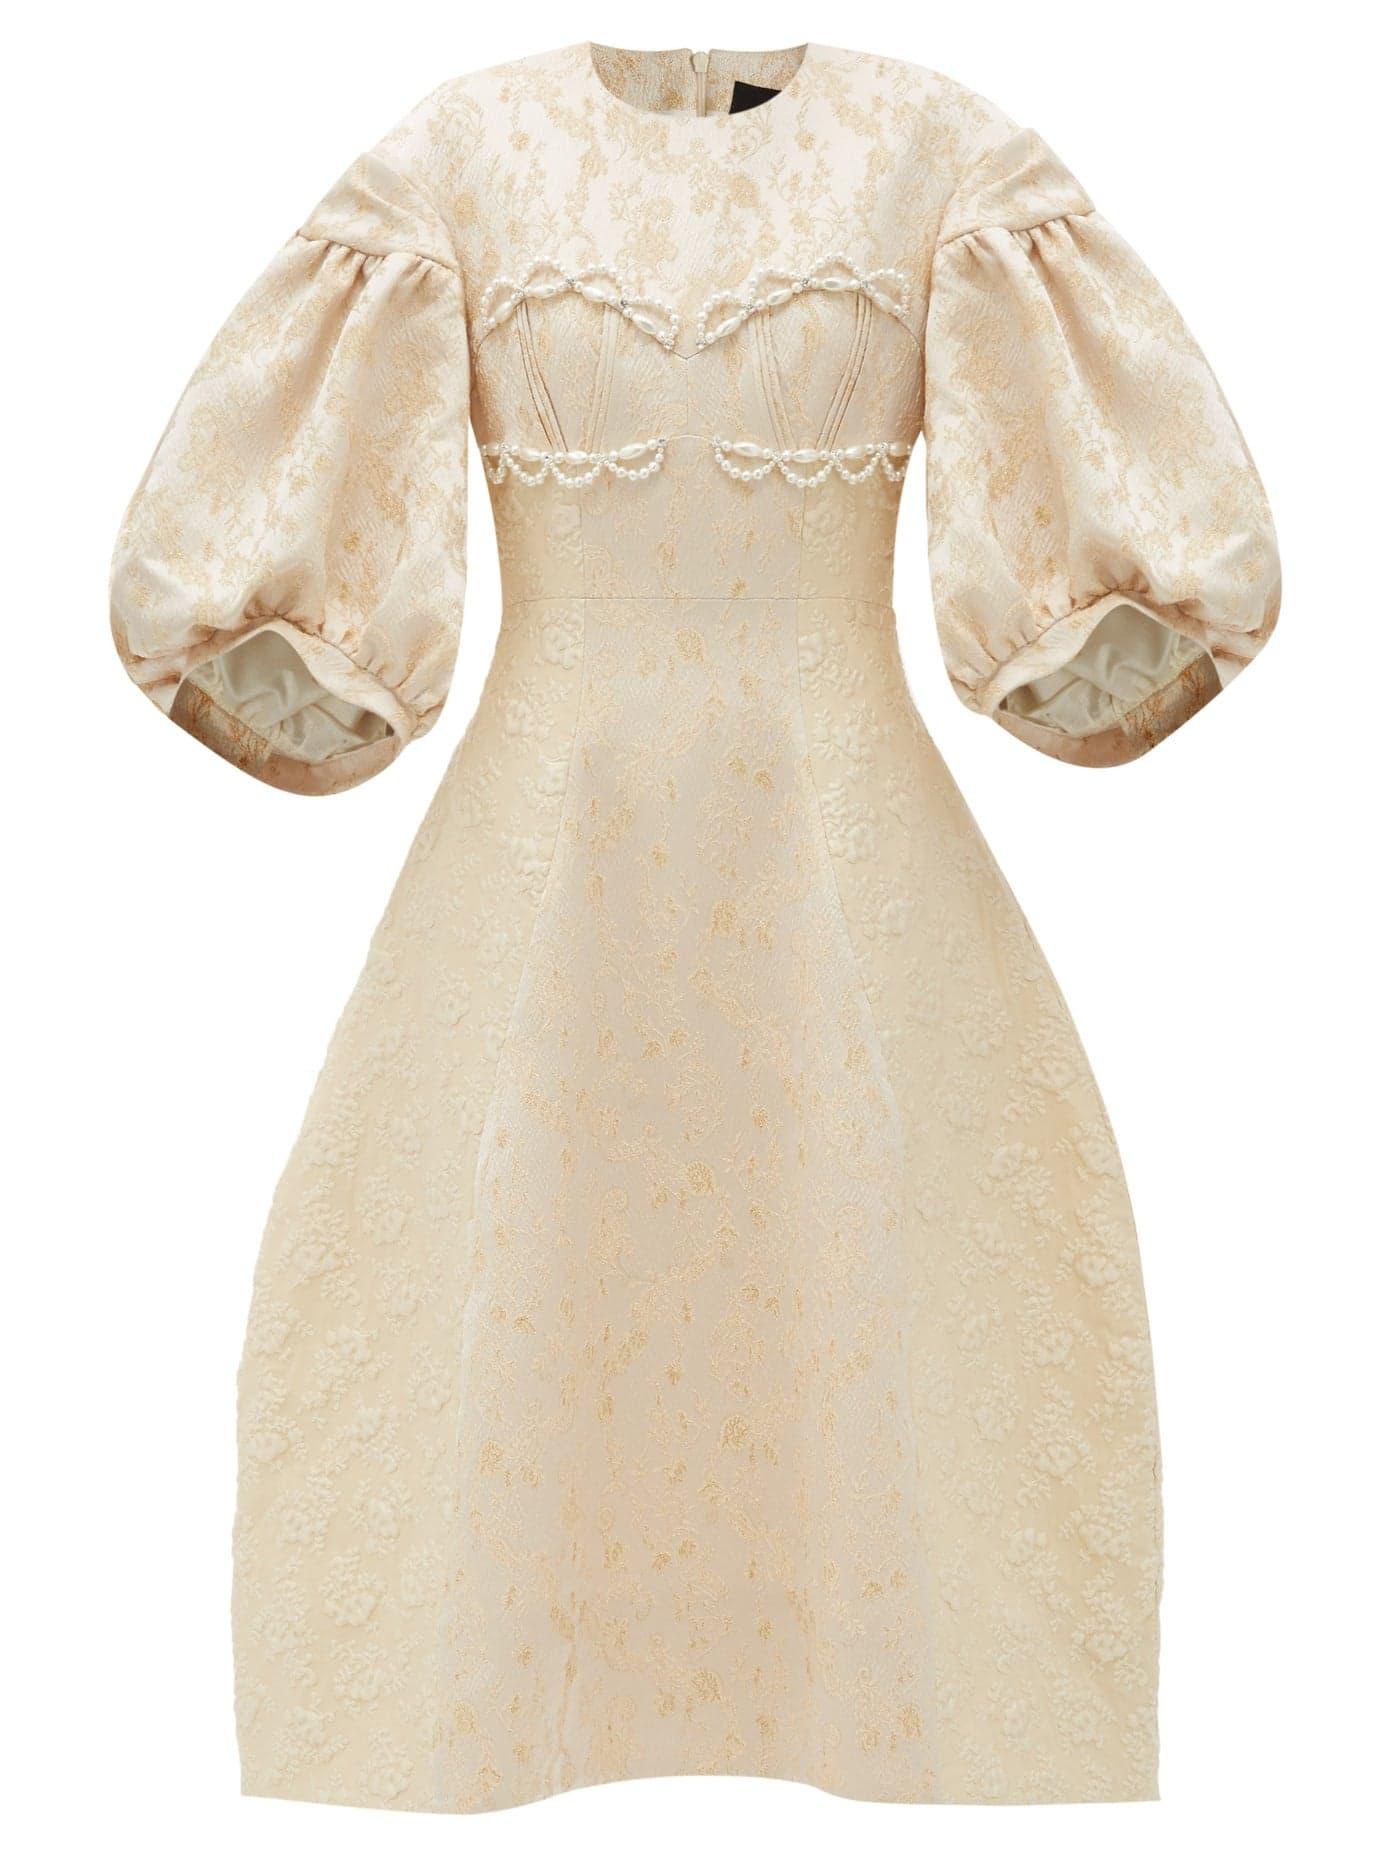 Simone Rocha Cream Brocade Dress Gathered Sleeves